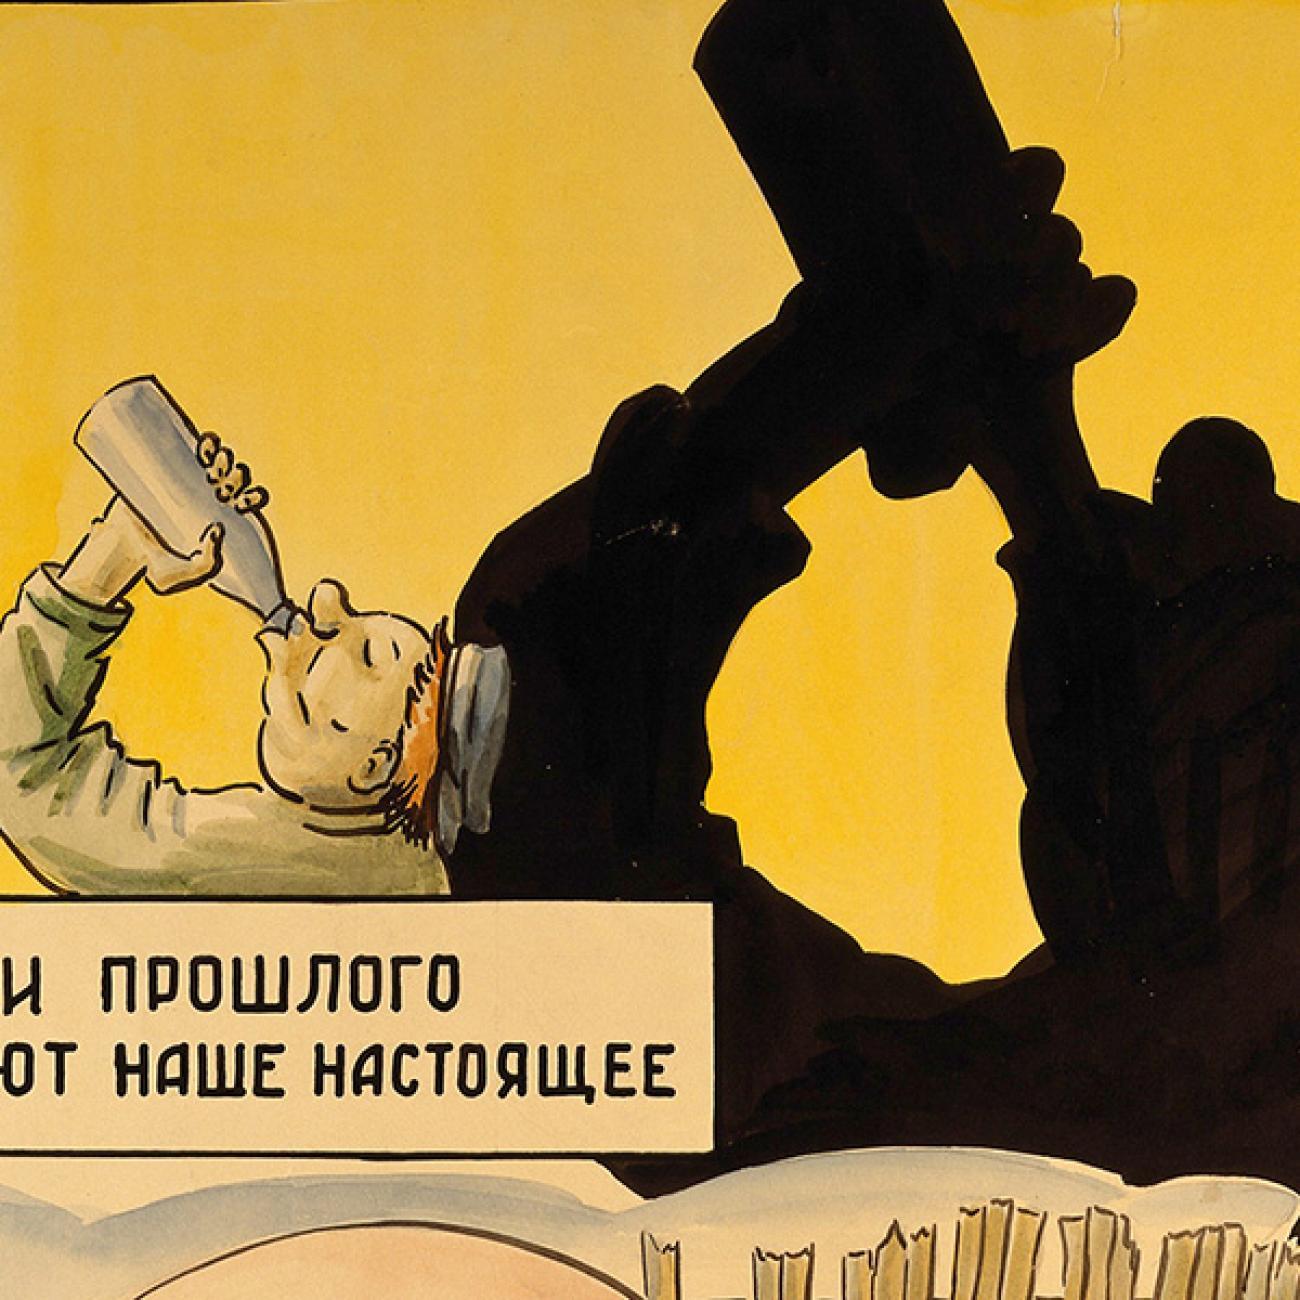 https://www.thinkglobalhealth.org/sites/default/files/styles/max_1300x1300_1_1/public/2020-03/EG.KK-RussianOH-2.24.20-1950s-SQUARE.jpg?itok=N-xcWUlc